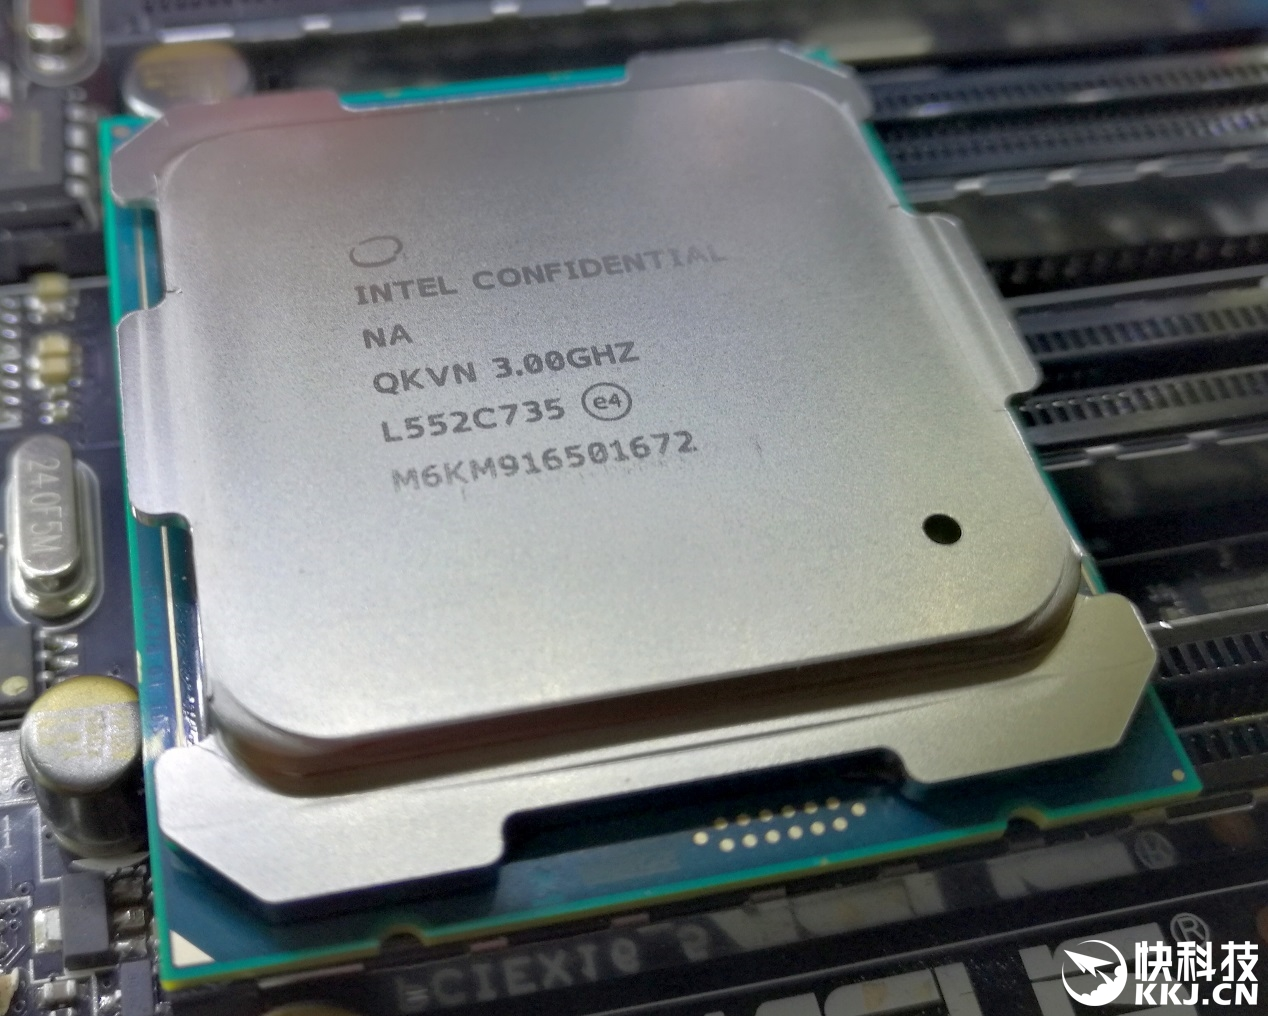 8�]x�o6�n �_首款桌面十核i7-6950x详尽测试